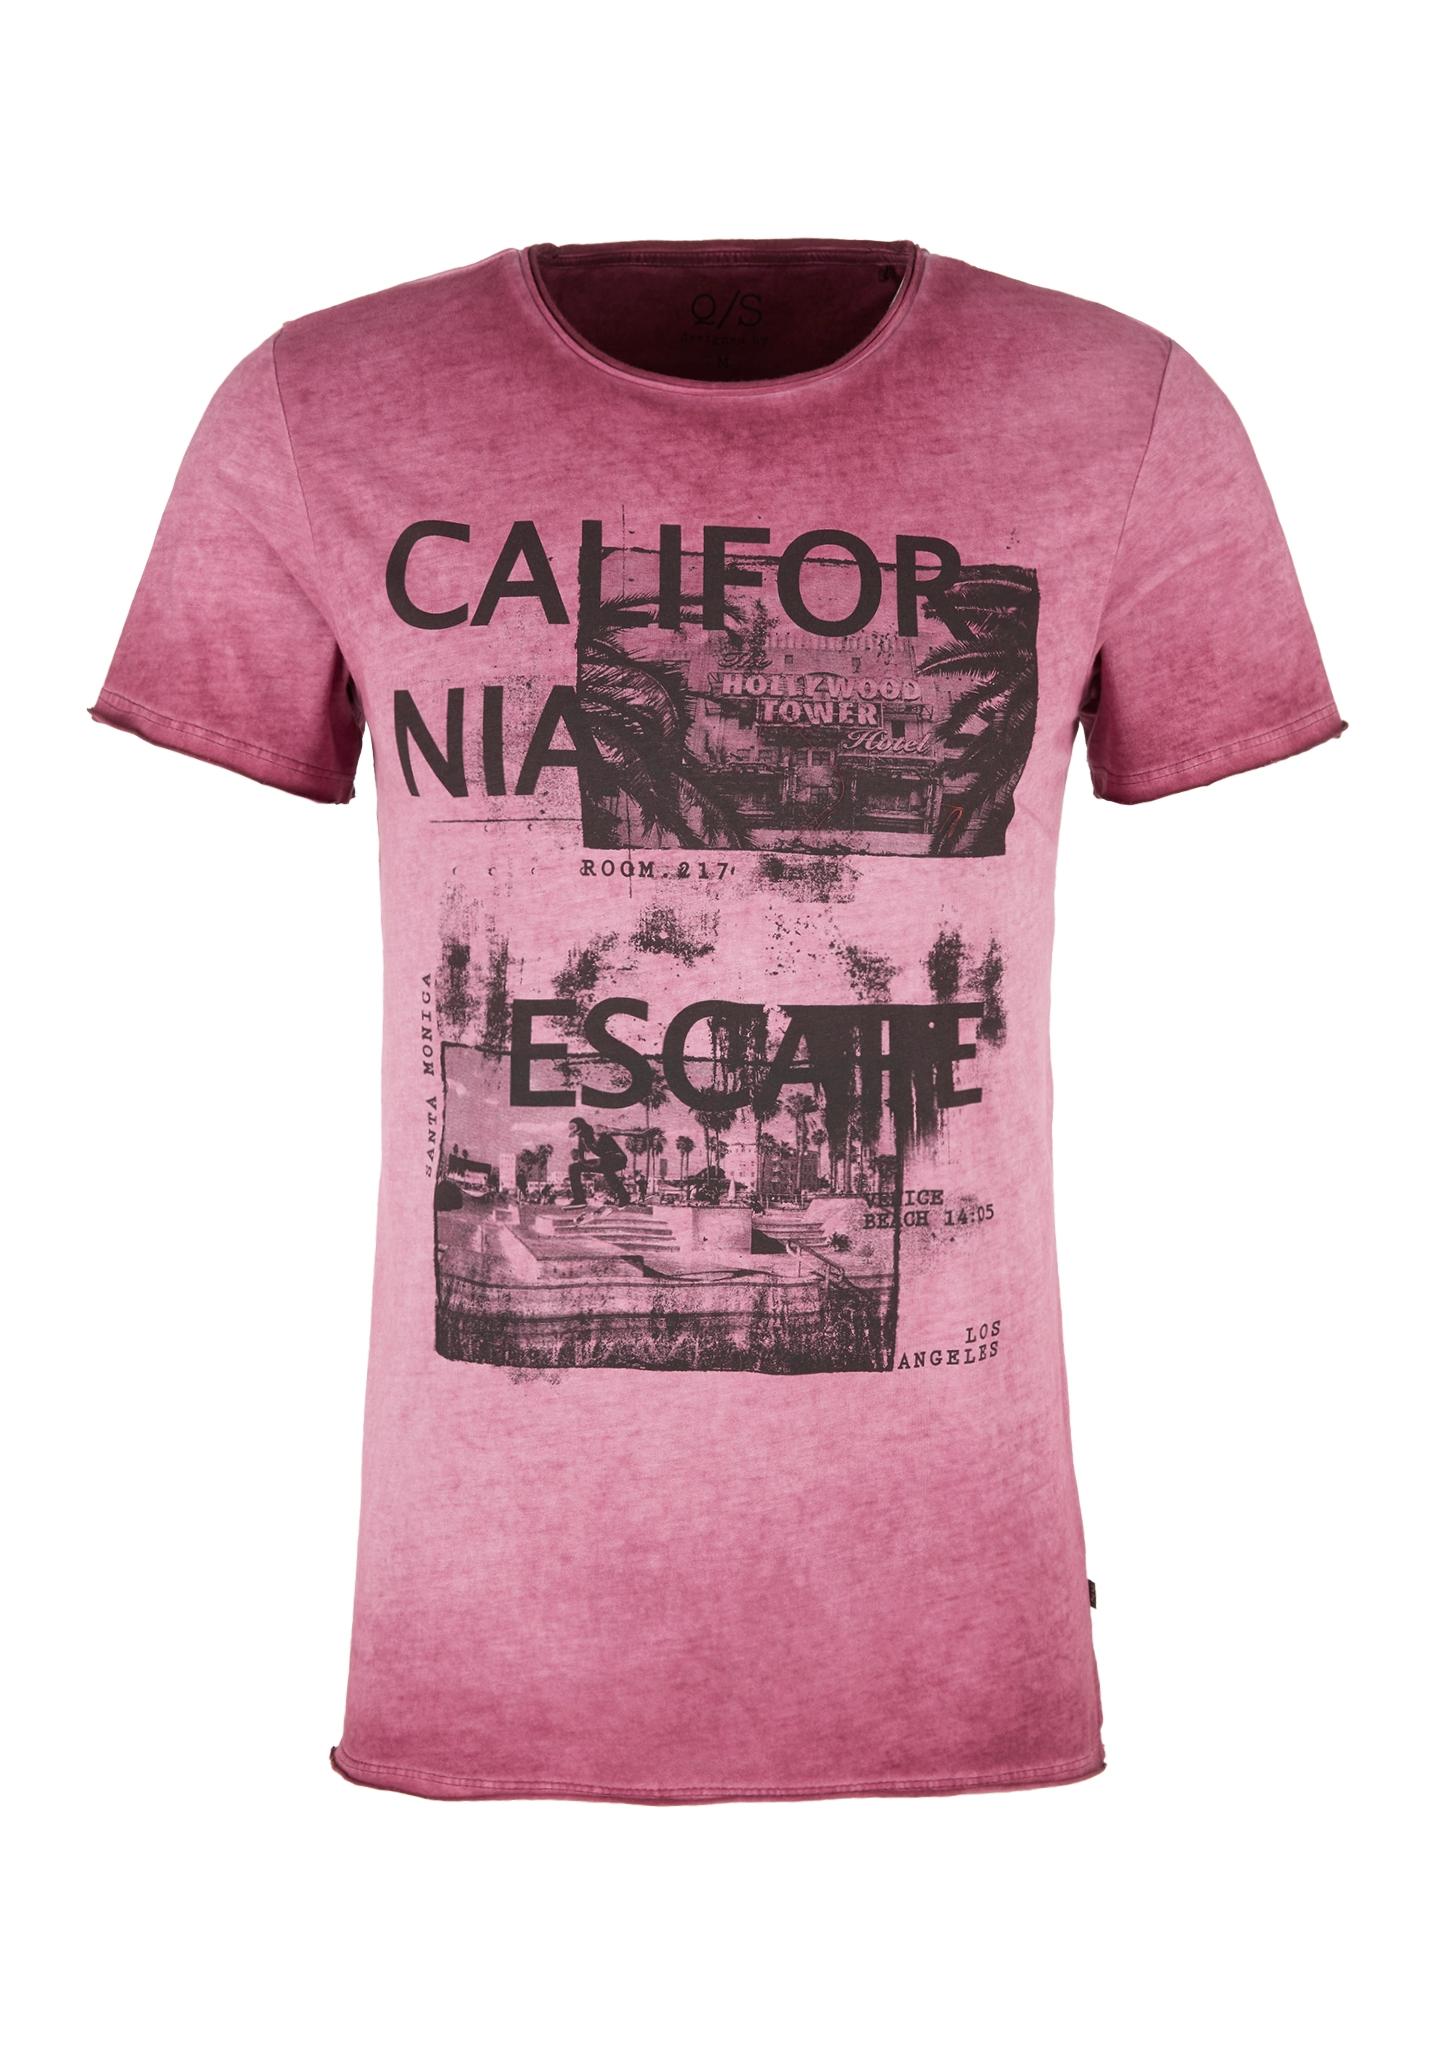 Print-Shirt | Bekleidung > Shirts > Sonstige Shirts | Q/S designed by